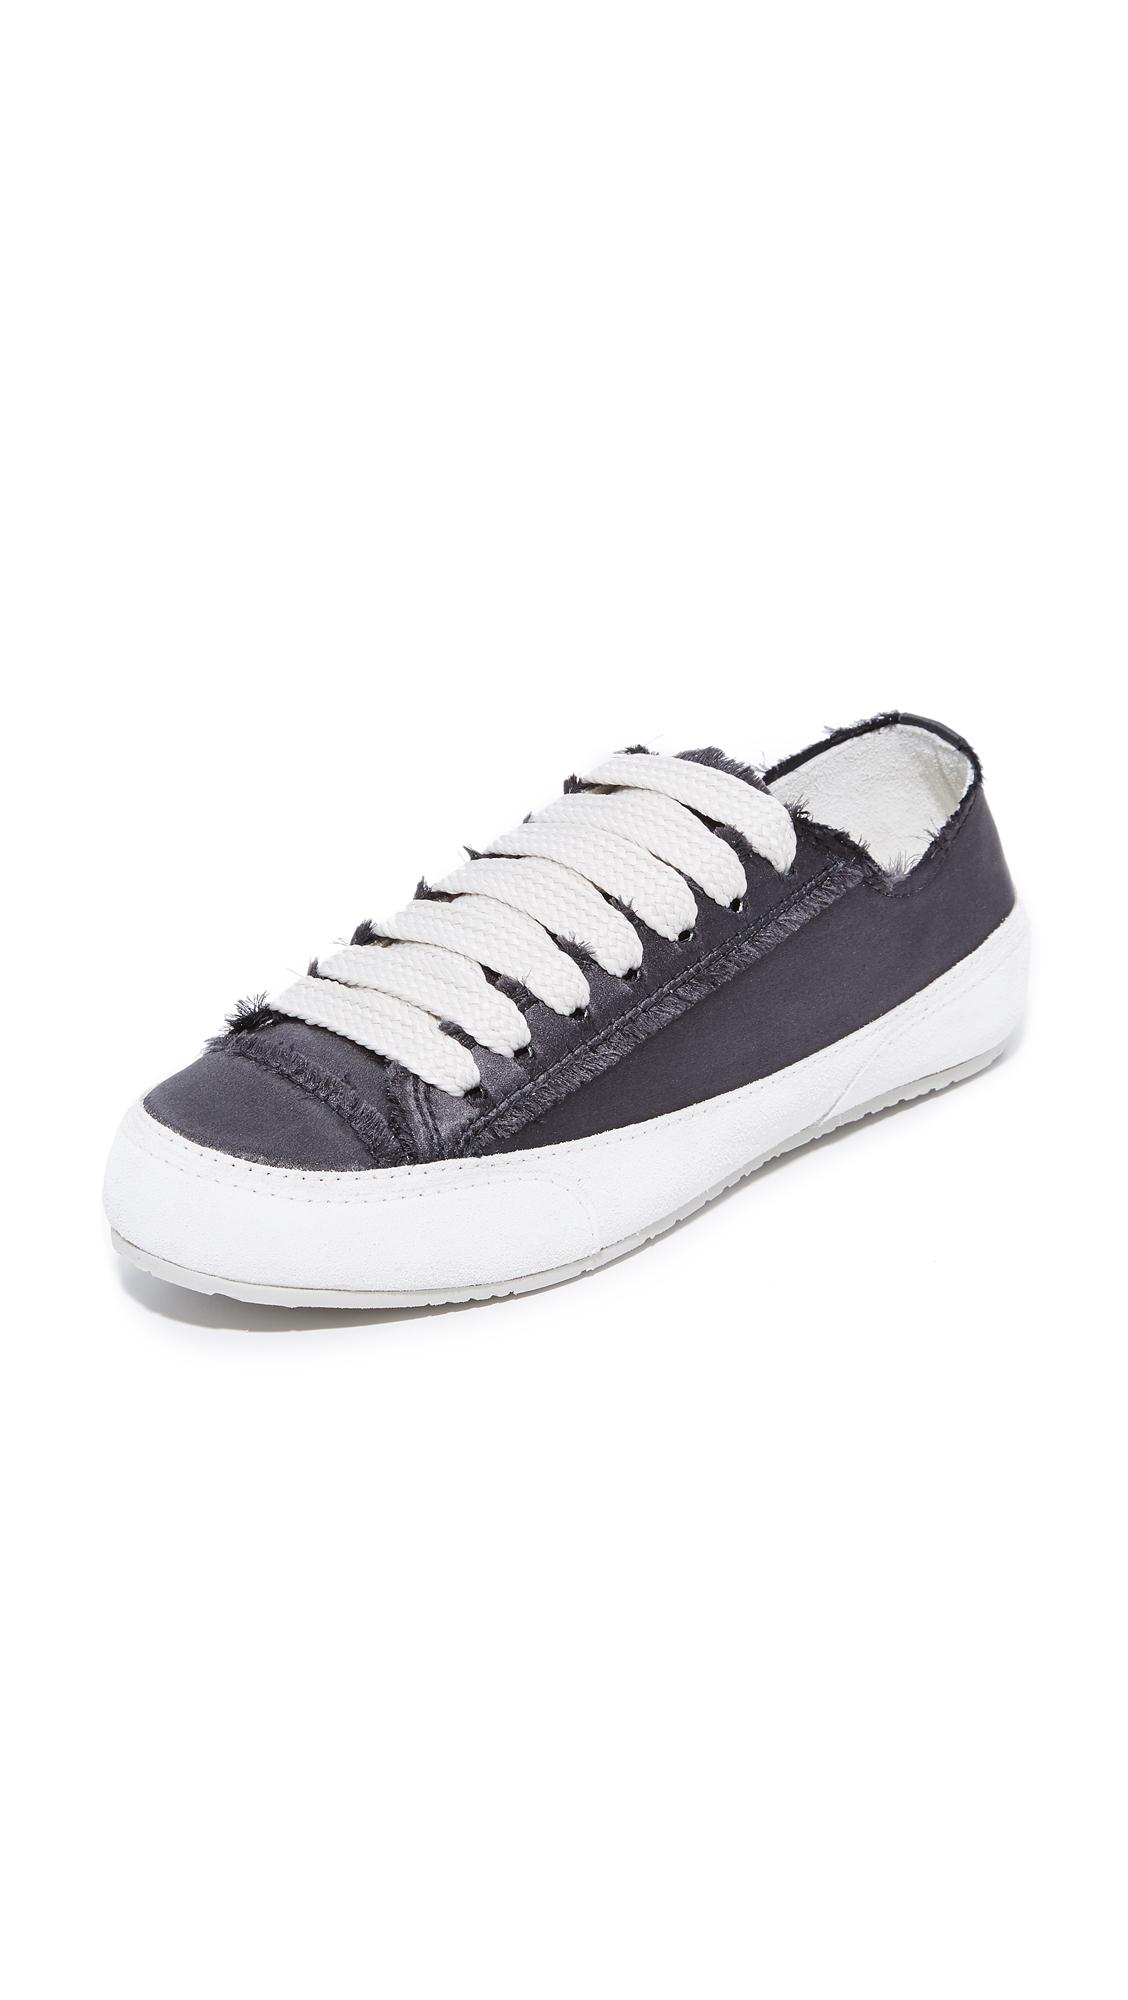 Pedro Garcia Parson Classic Sneakers - Off Black